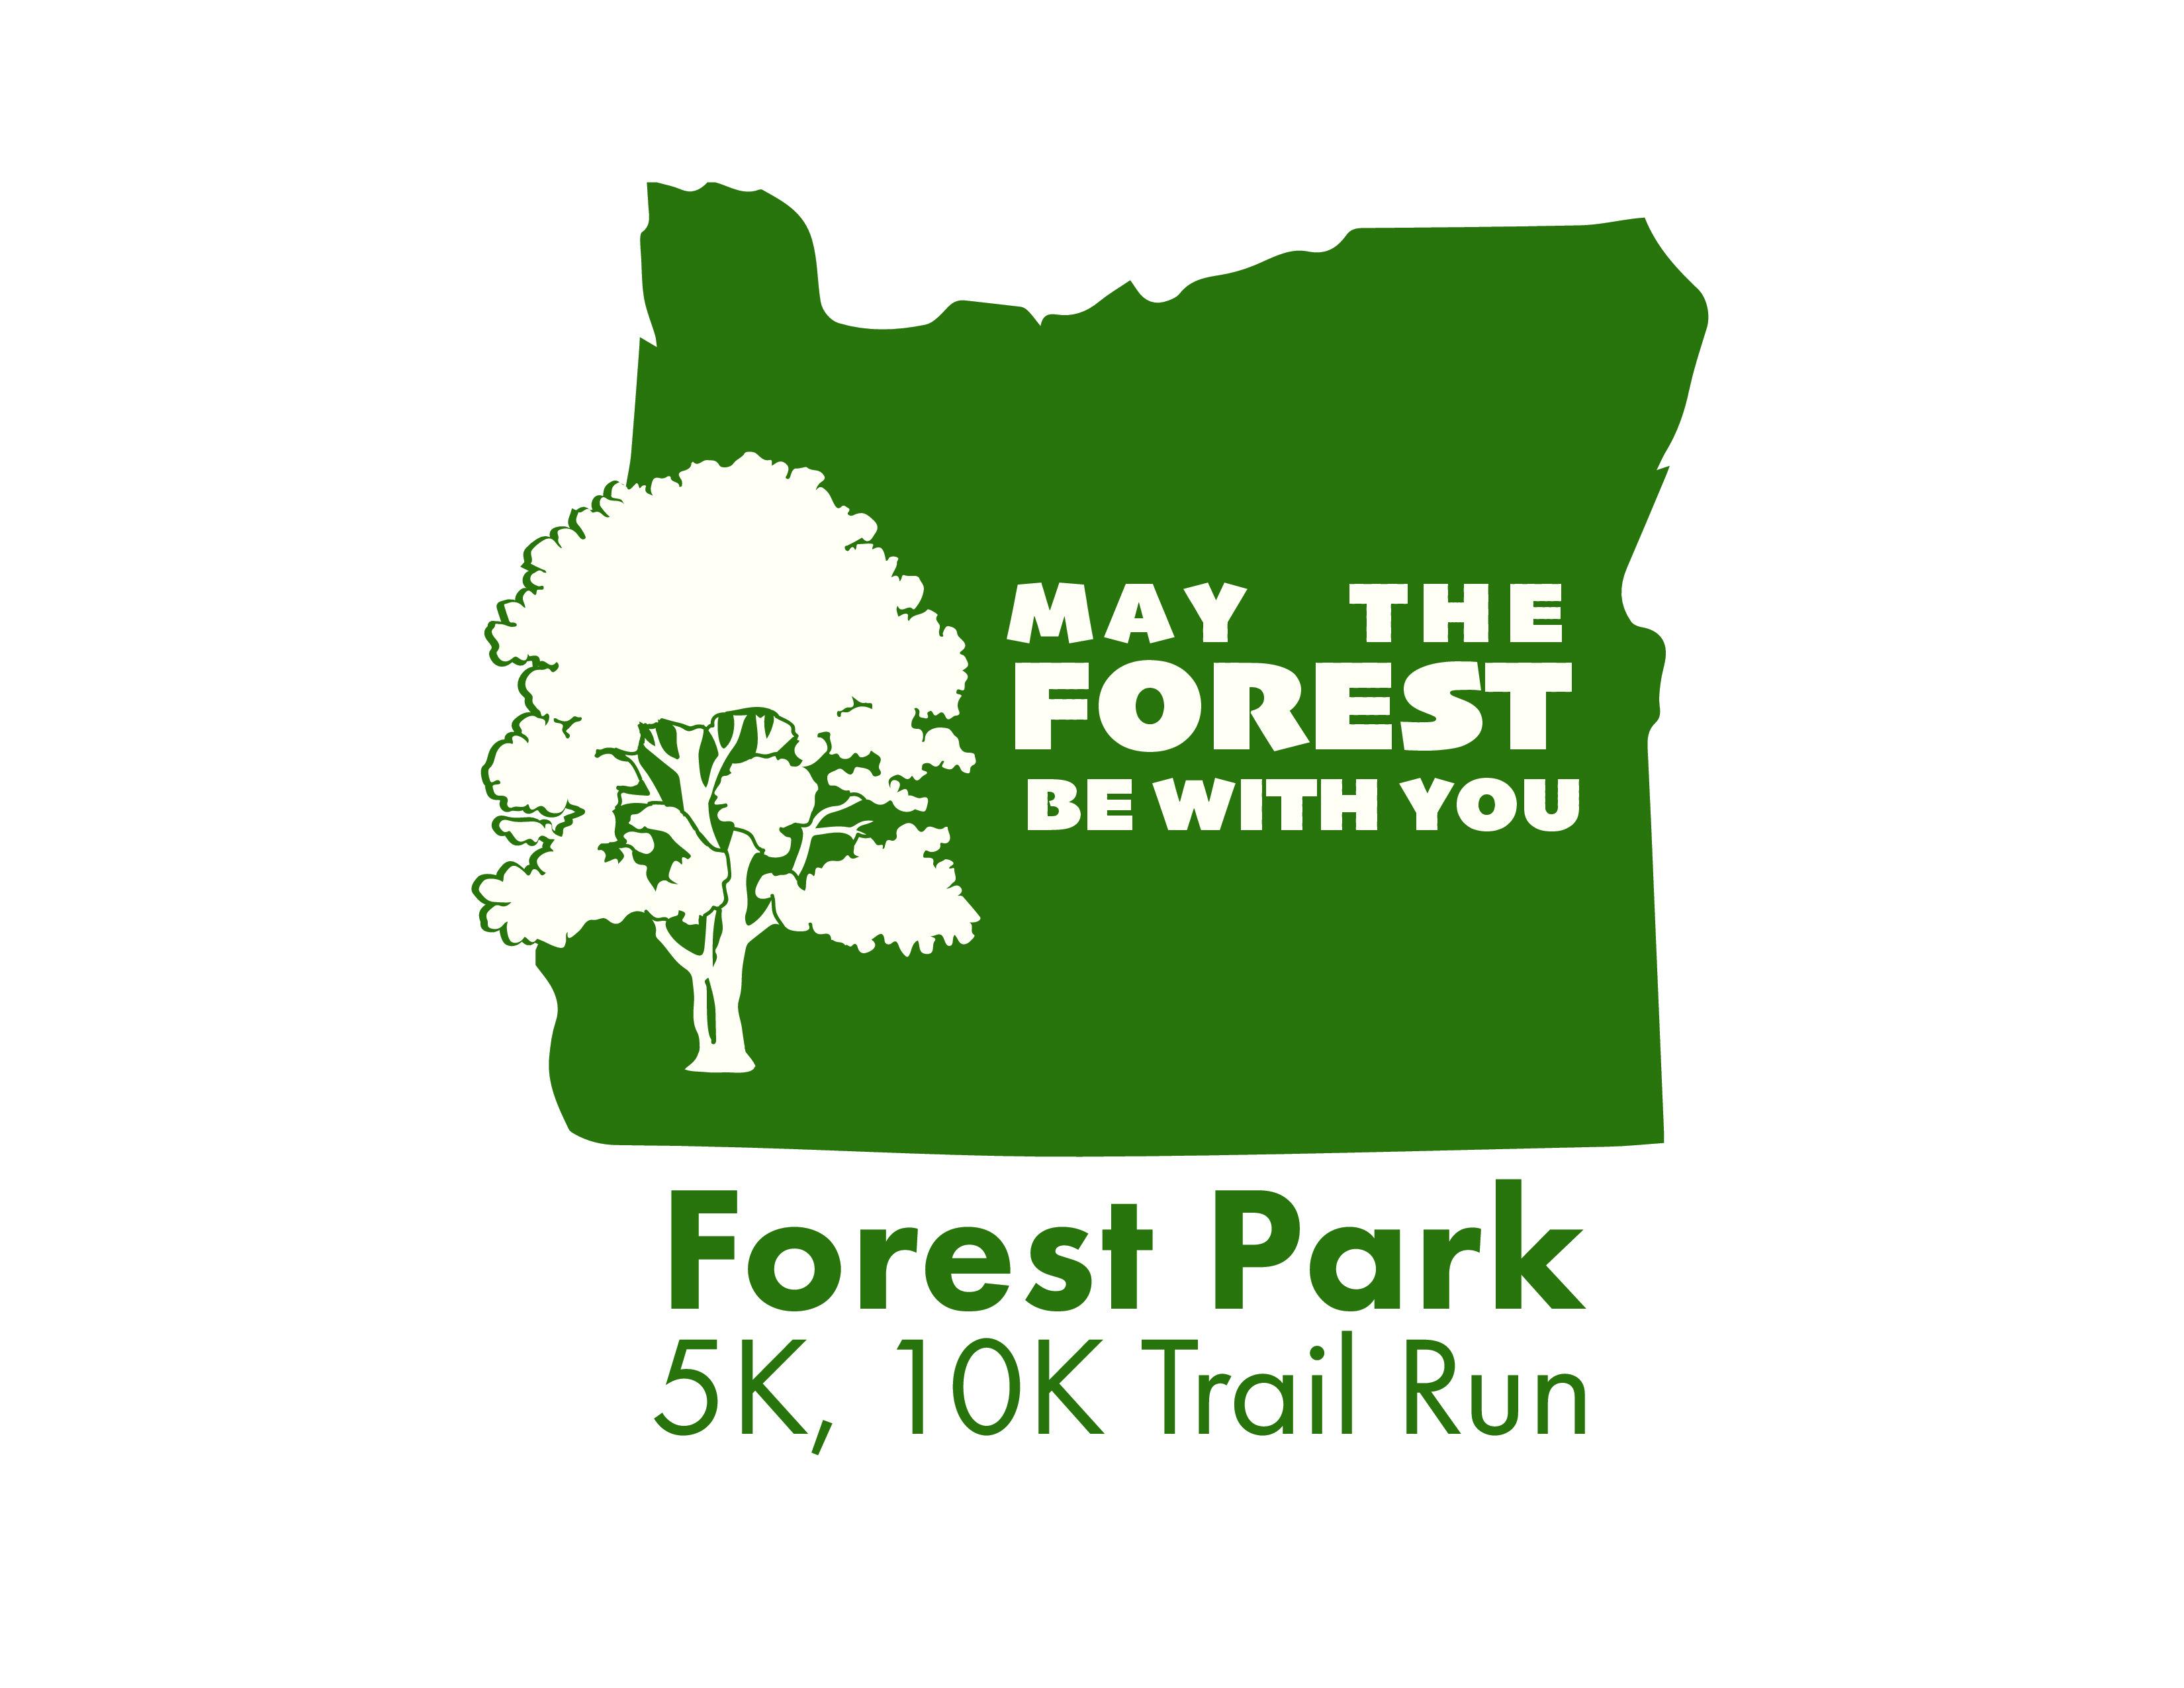 Forest Park Run